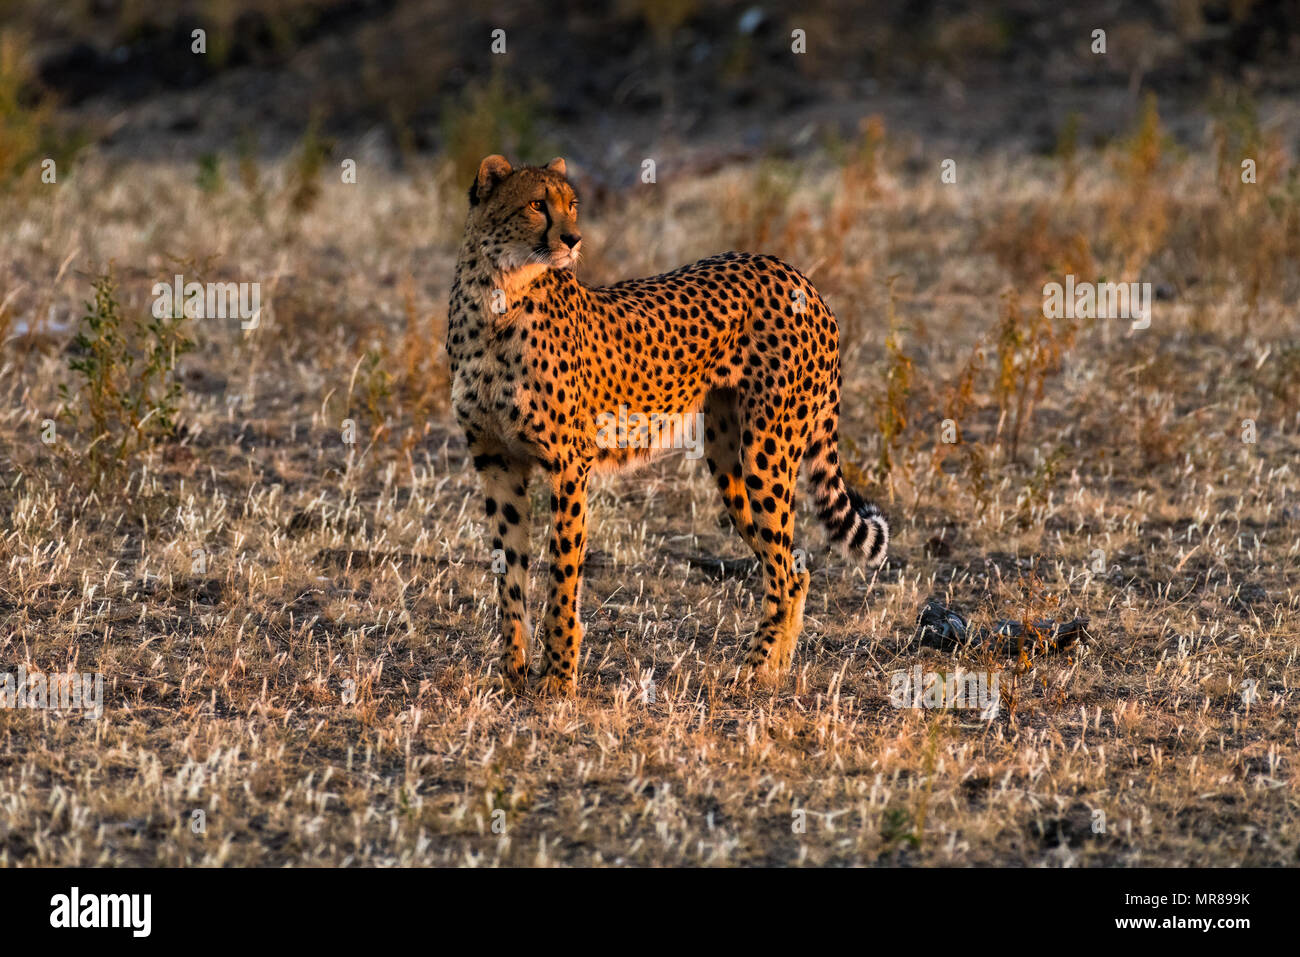 Cheetah at Mast Game Reserve Botswana - Stock Image